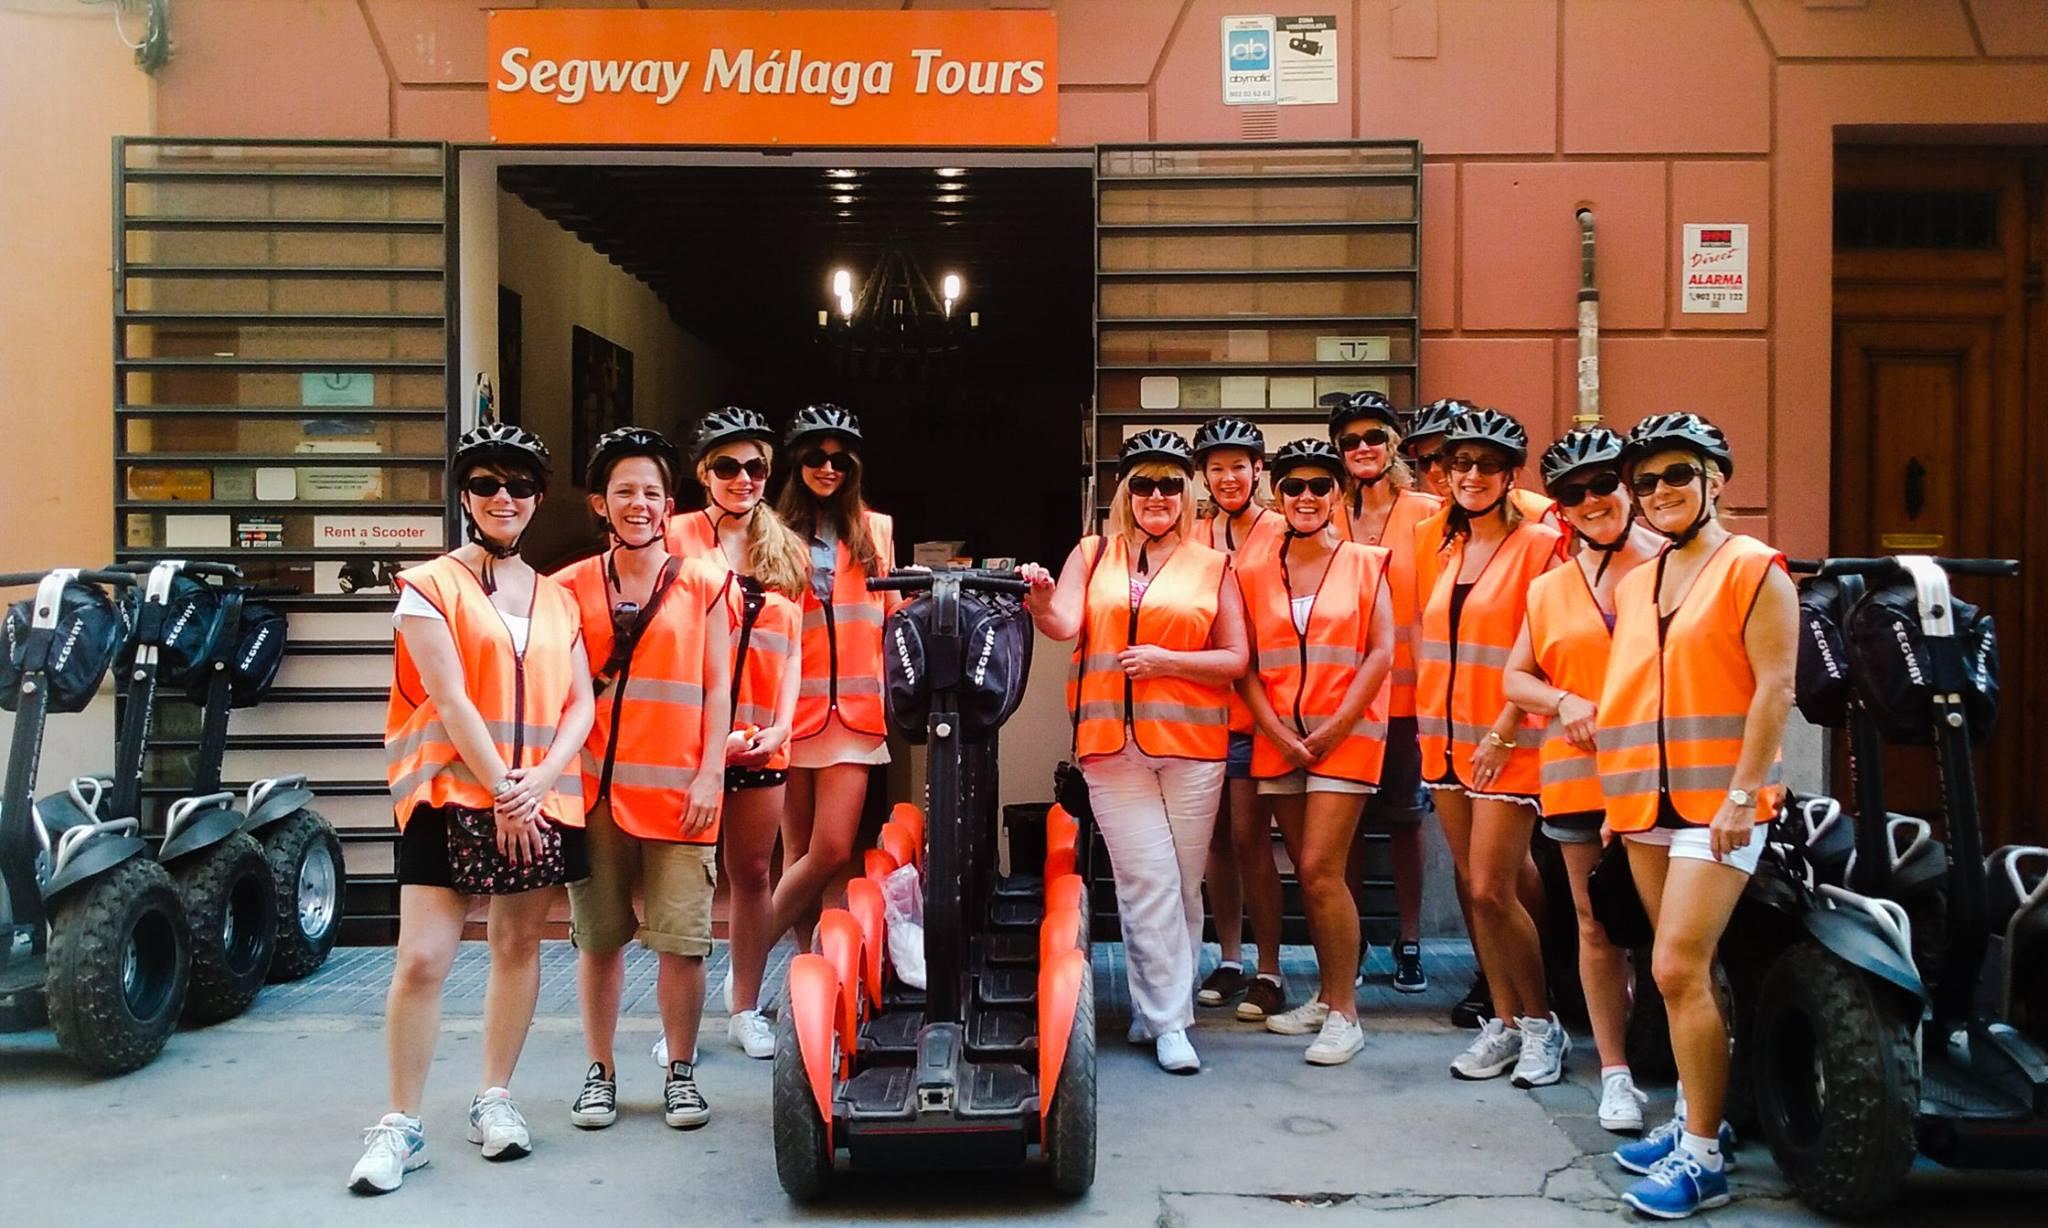 Segway Malaga Tours for professionalism